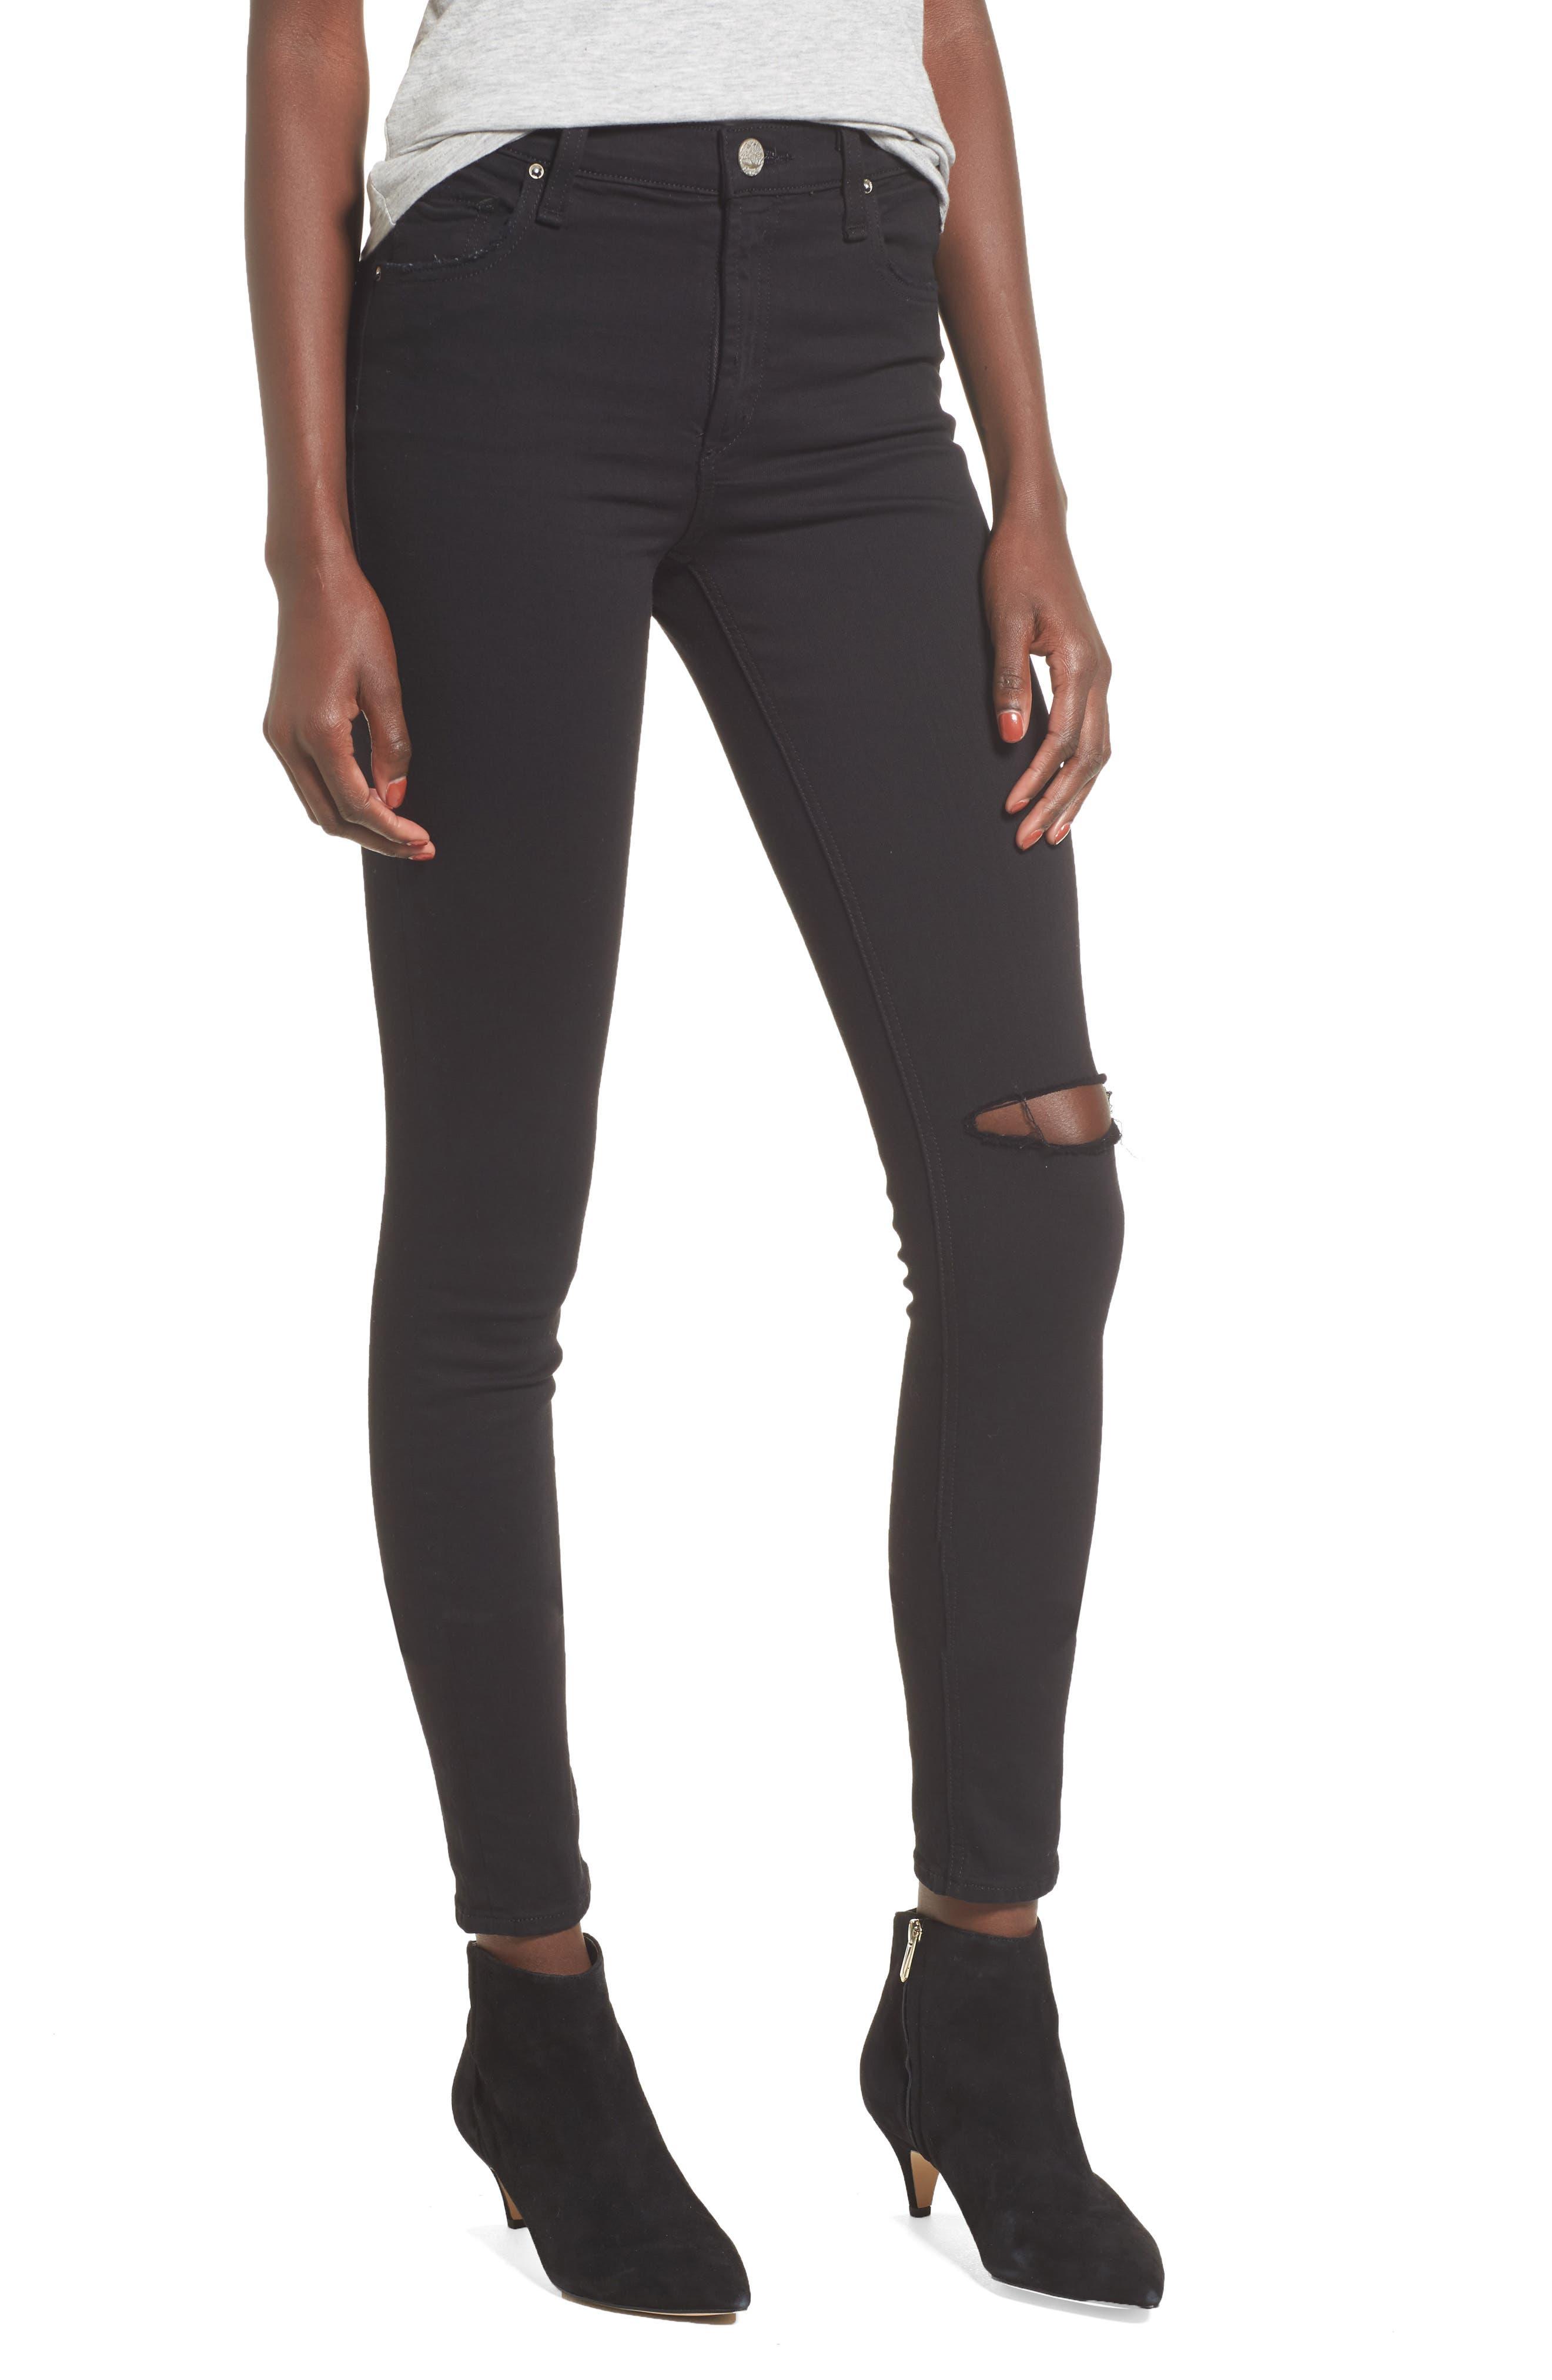 Main Image - McGuire Newton High Waist Ankle Skinny Jeans (Reposado)